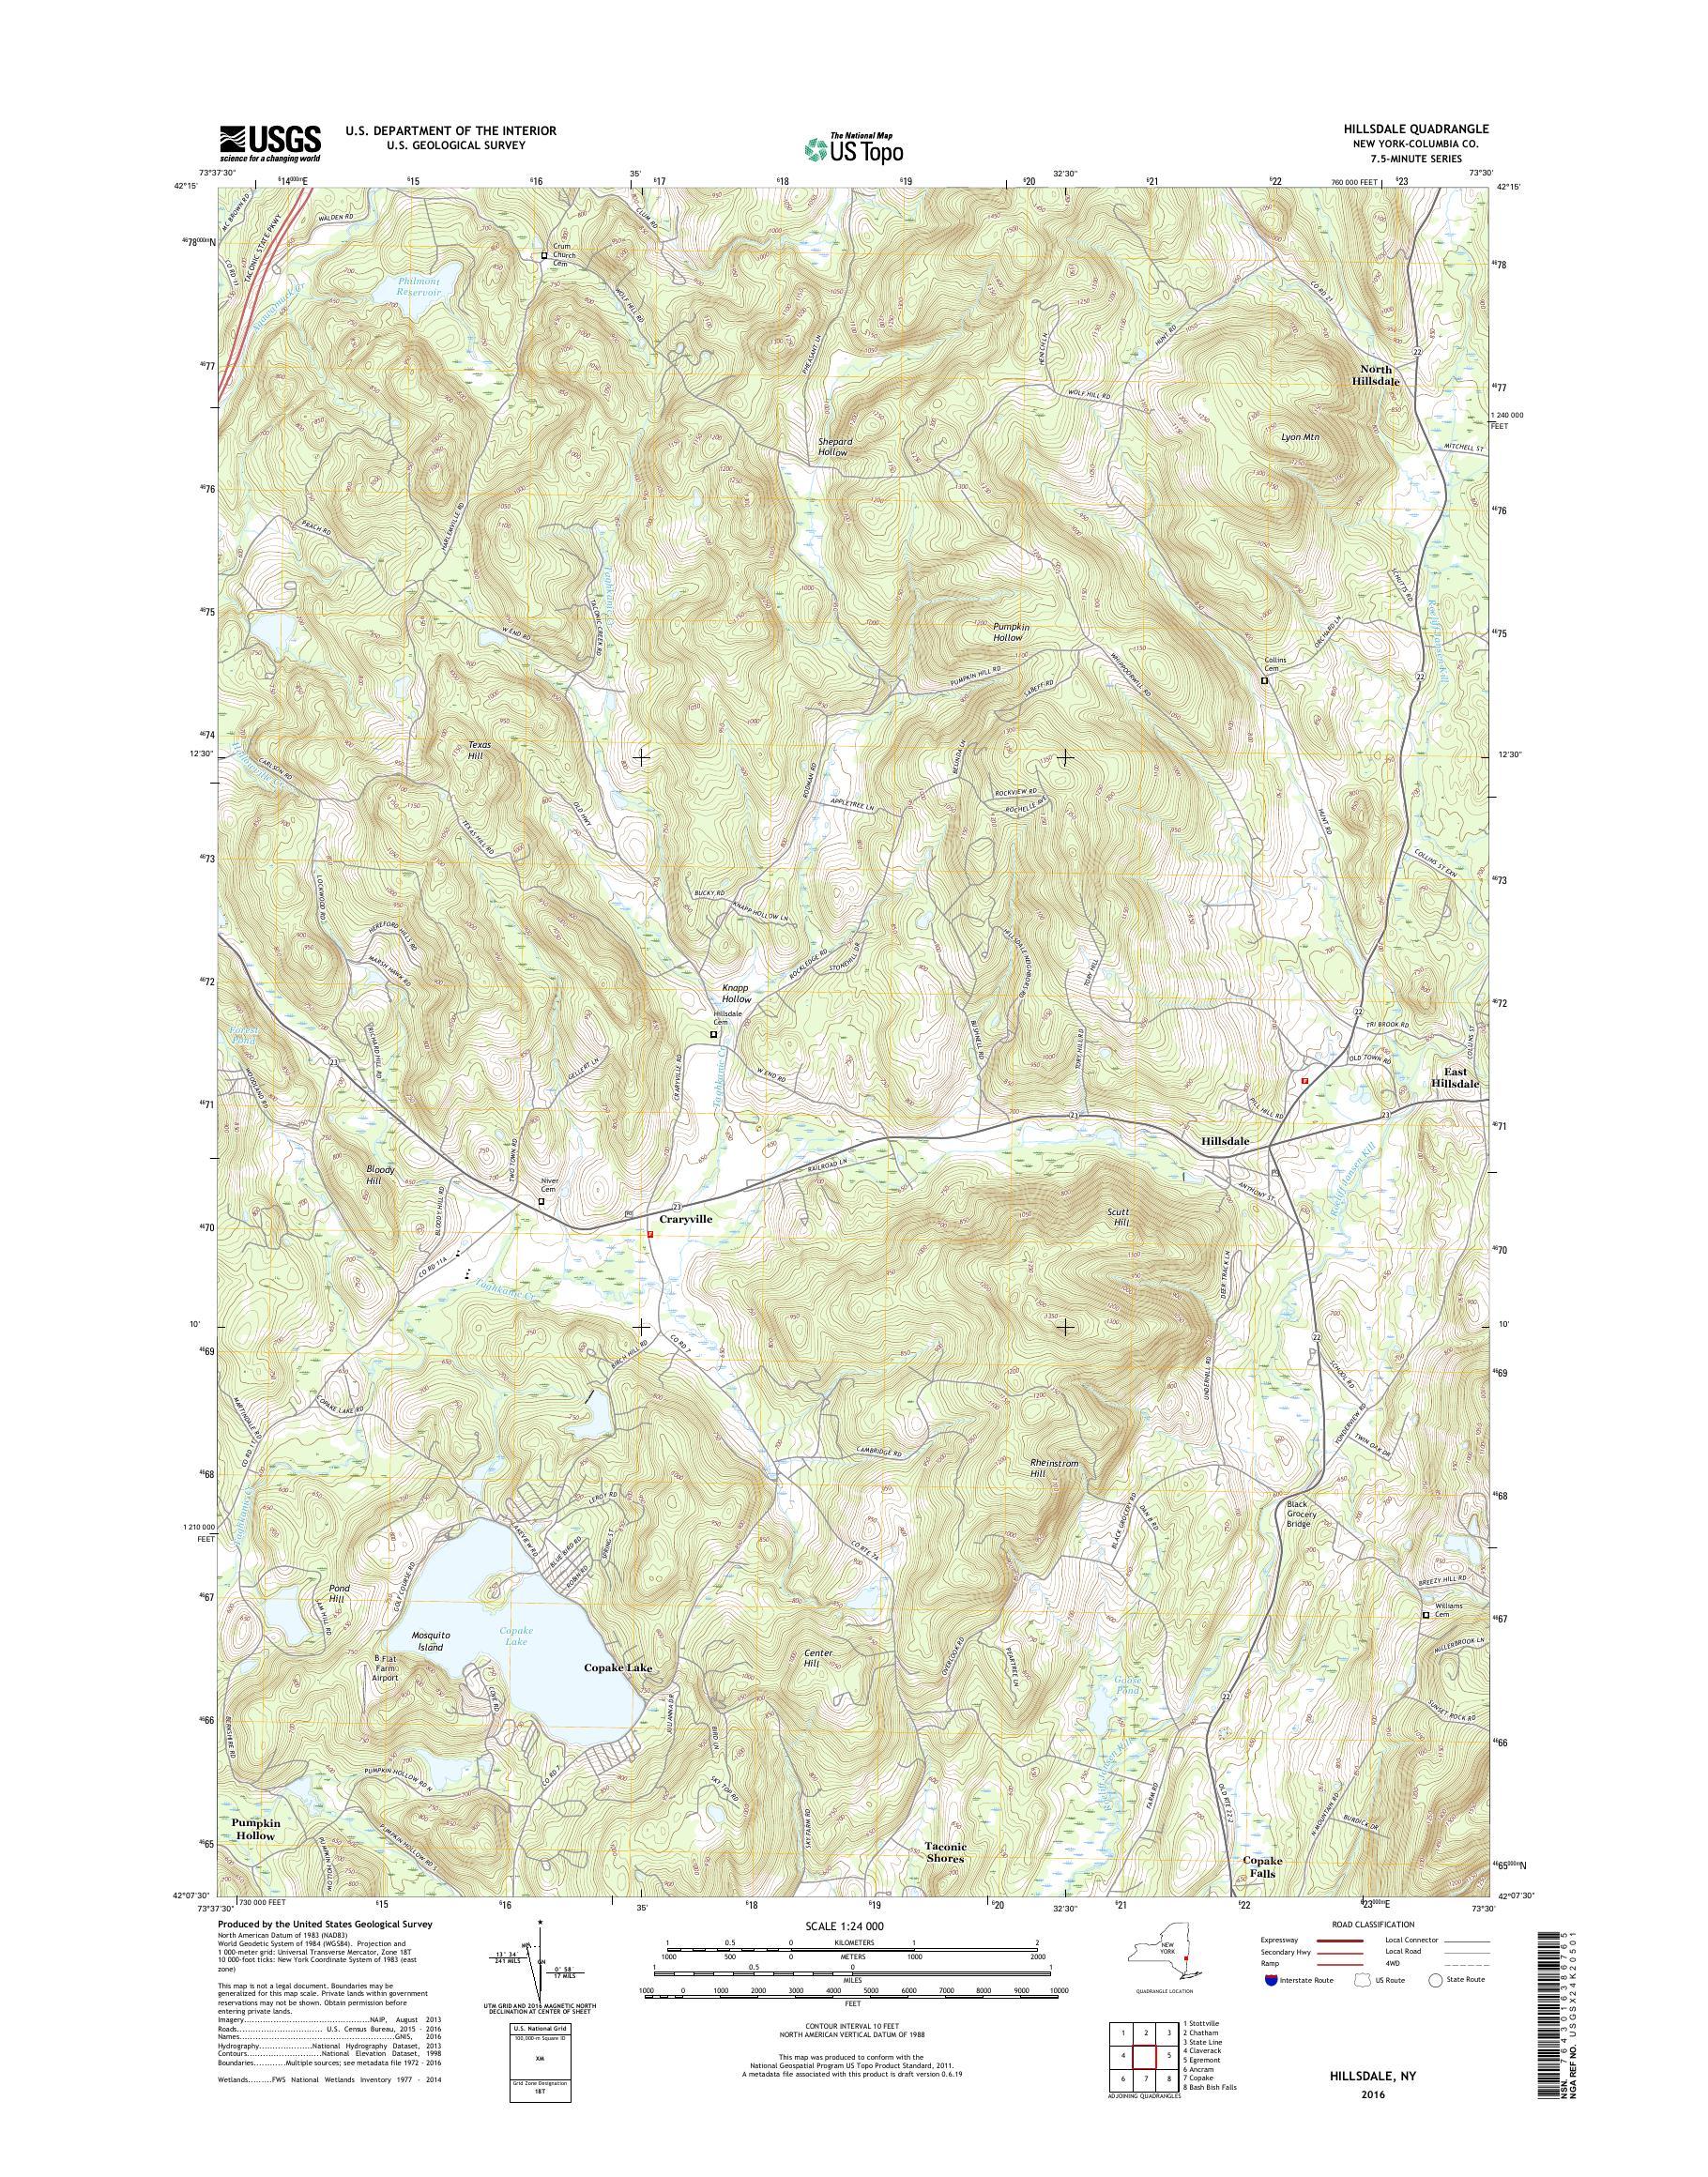 MyTopo Hillsdale, New York USGS Quad Topo Map